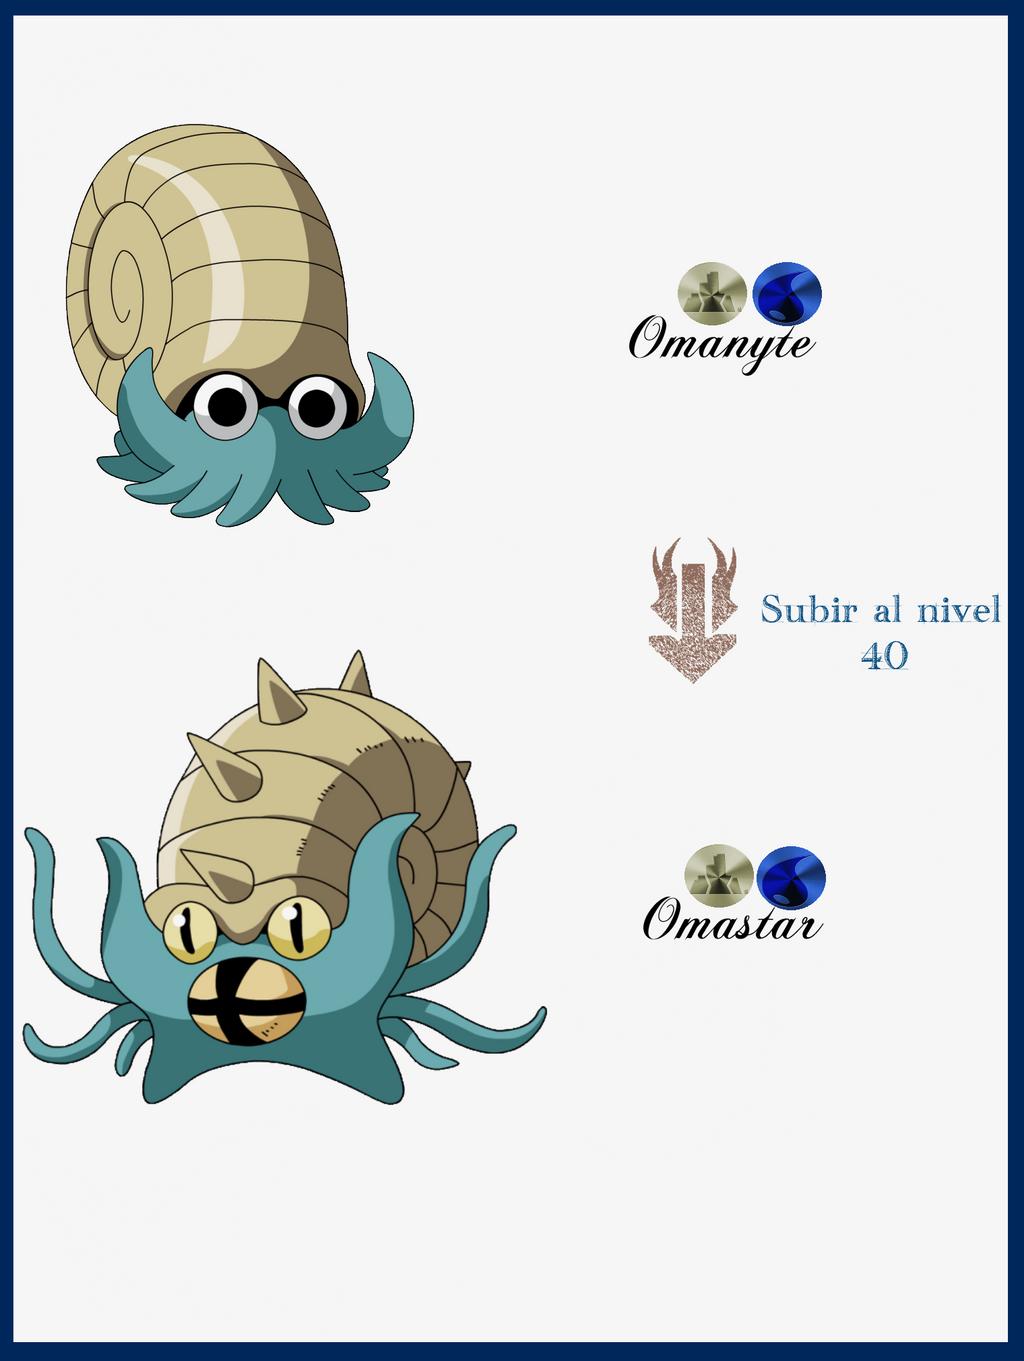 Pokemon Omanyte Evolution Images | Pokemon Images